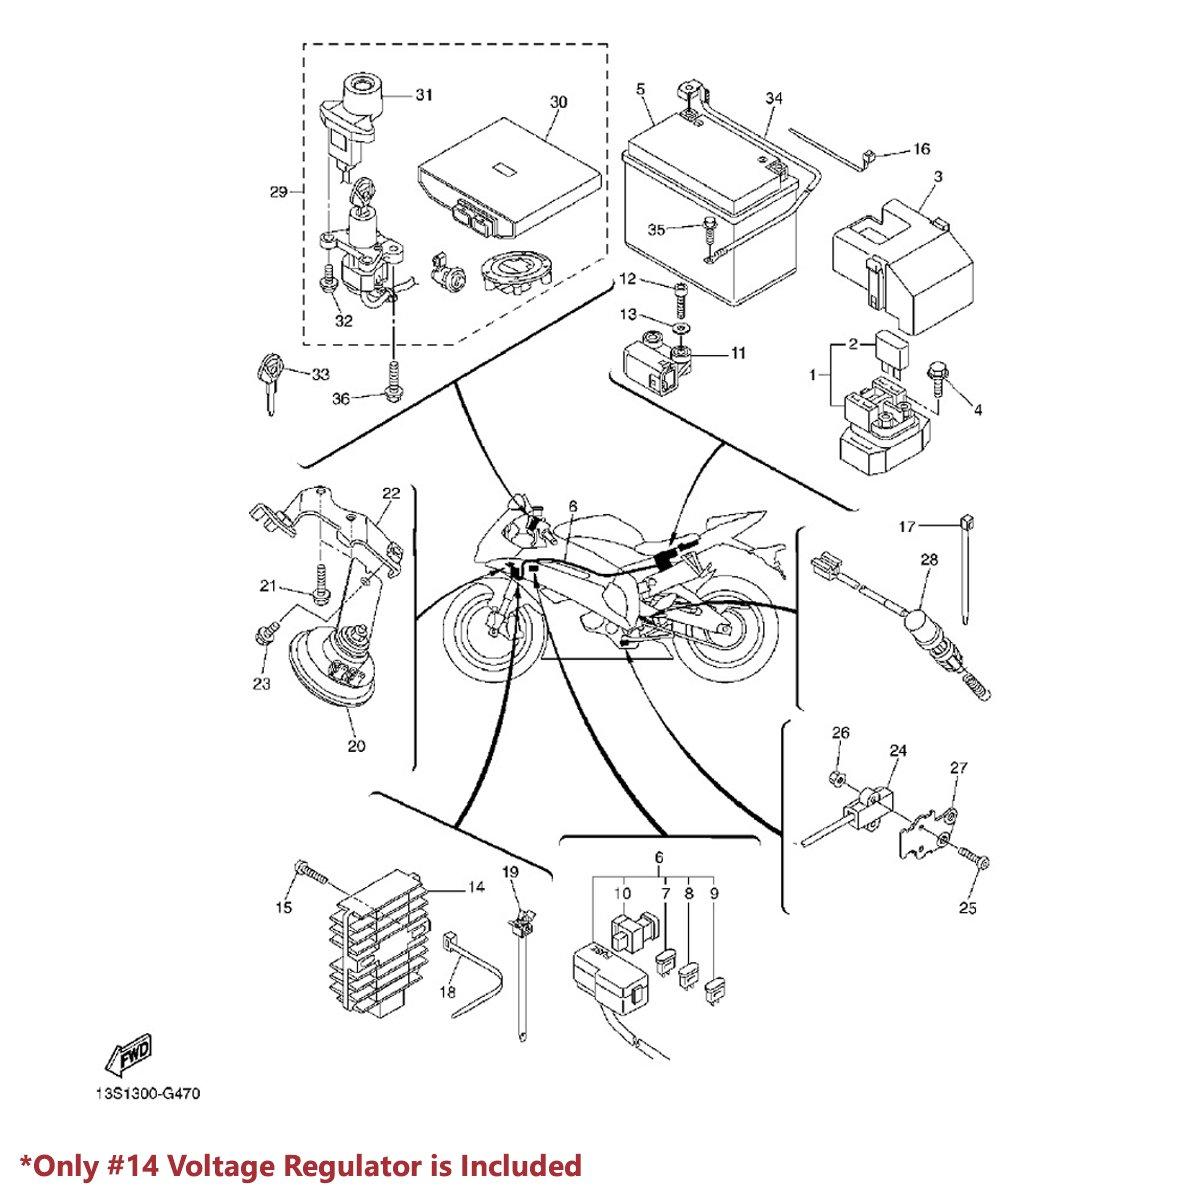 yamaha morphous 12 volt starter wiring diagram wiring diagram library yamaha morphous 12 volt starter wiring diagram wiring diagrams starter switch wiring diagram amazon com emusa